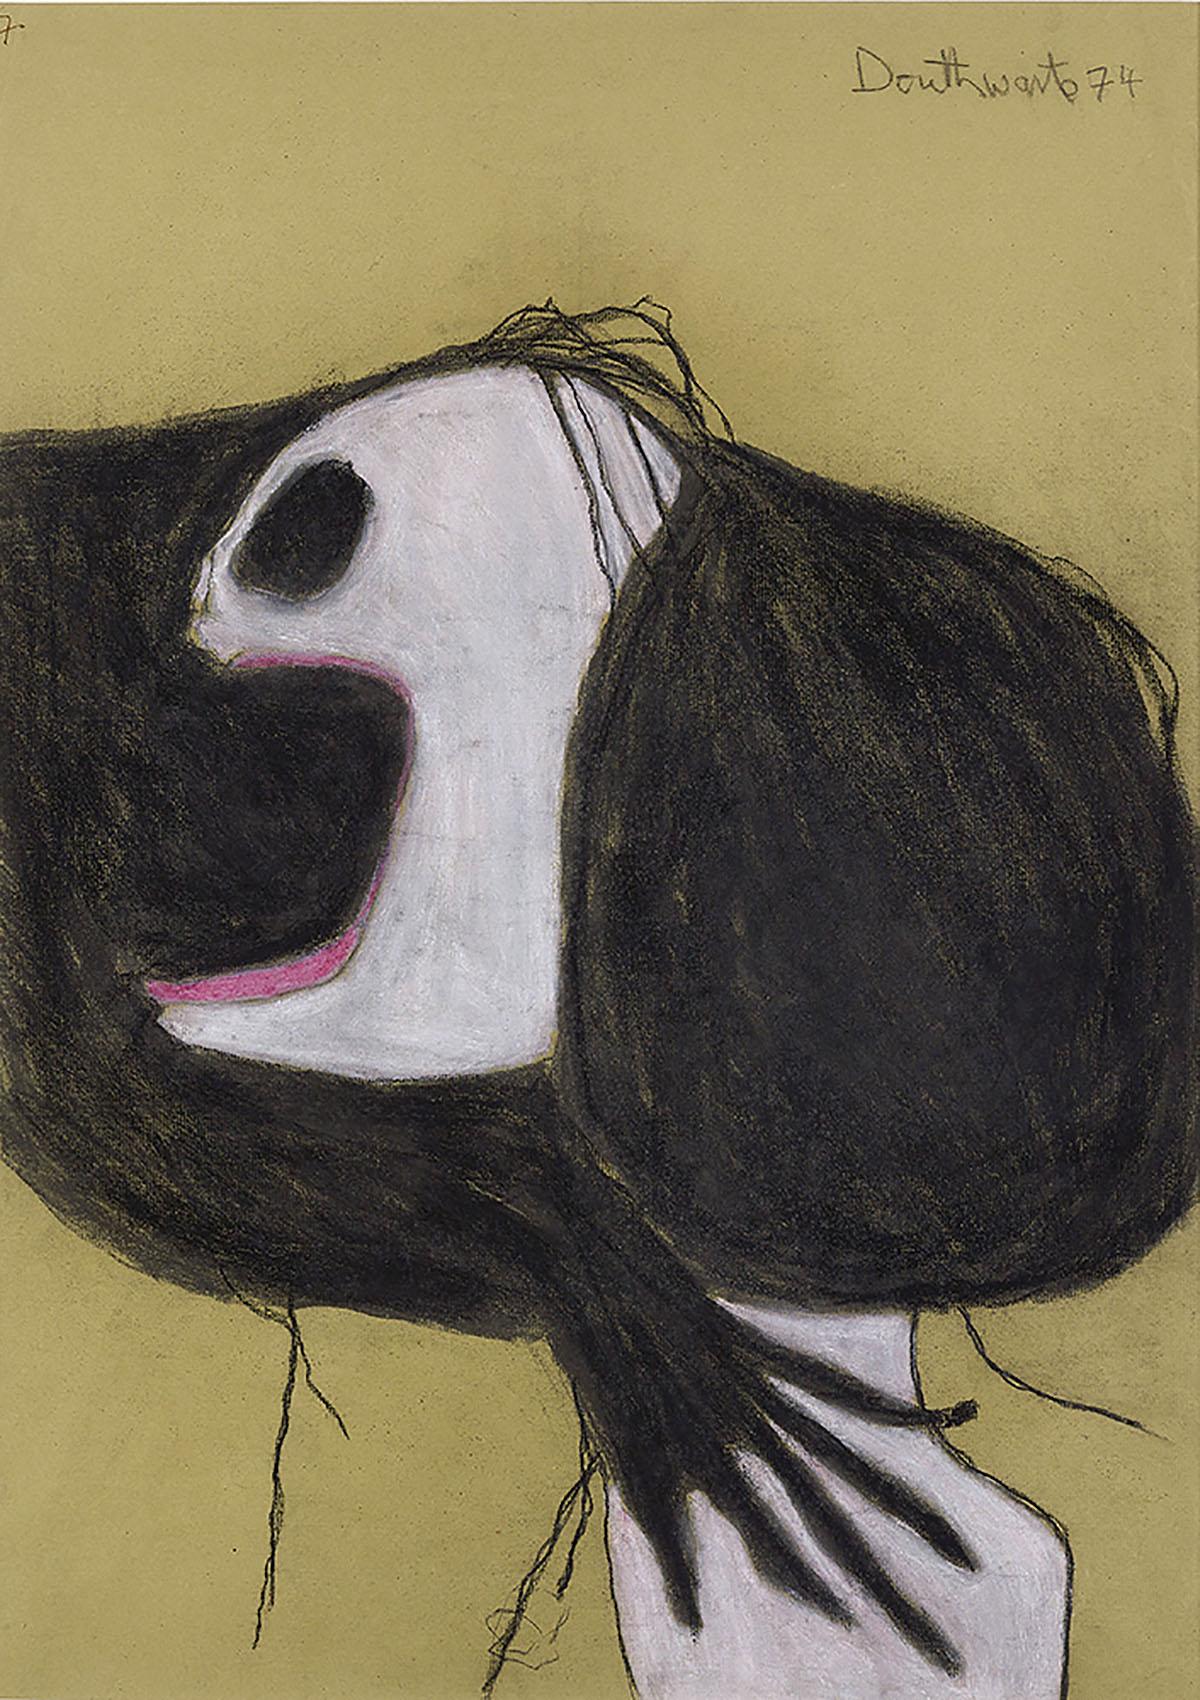 Pat Douthwaite, 'Goddess', oil, pastel, charcoal on paper